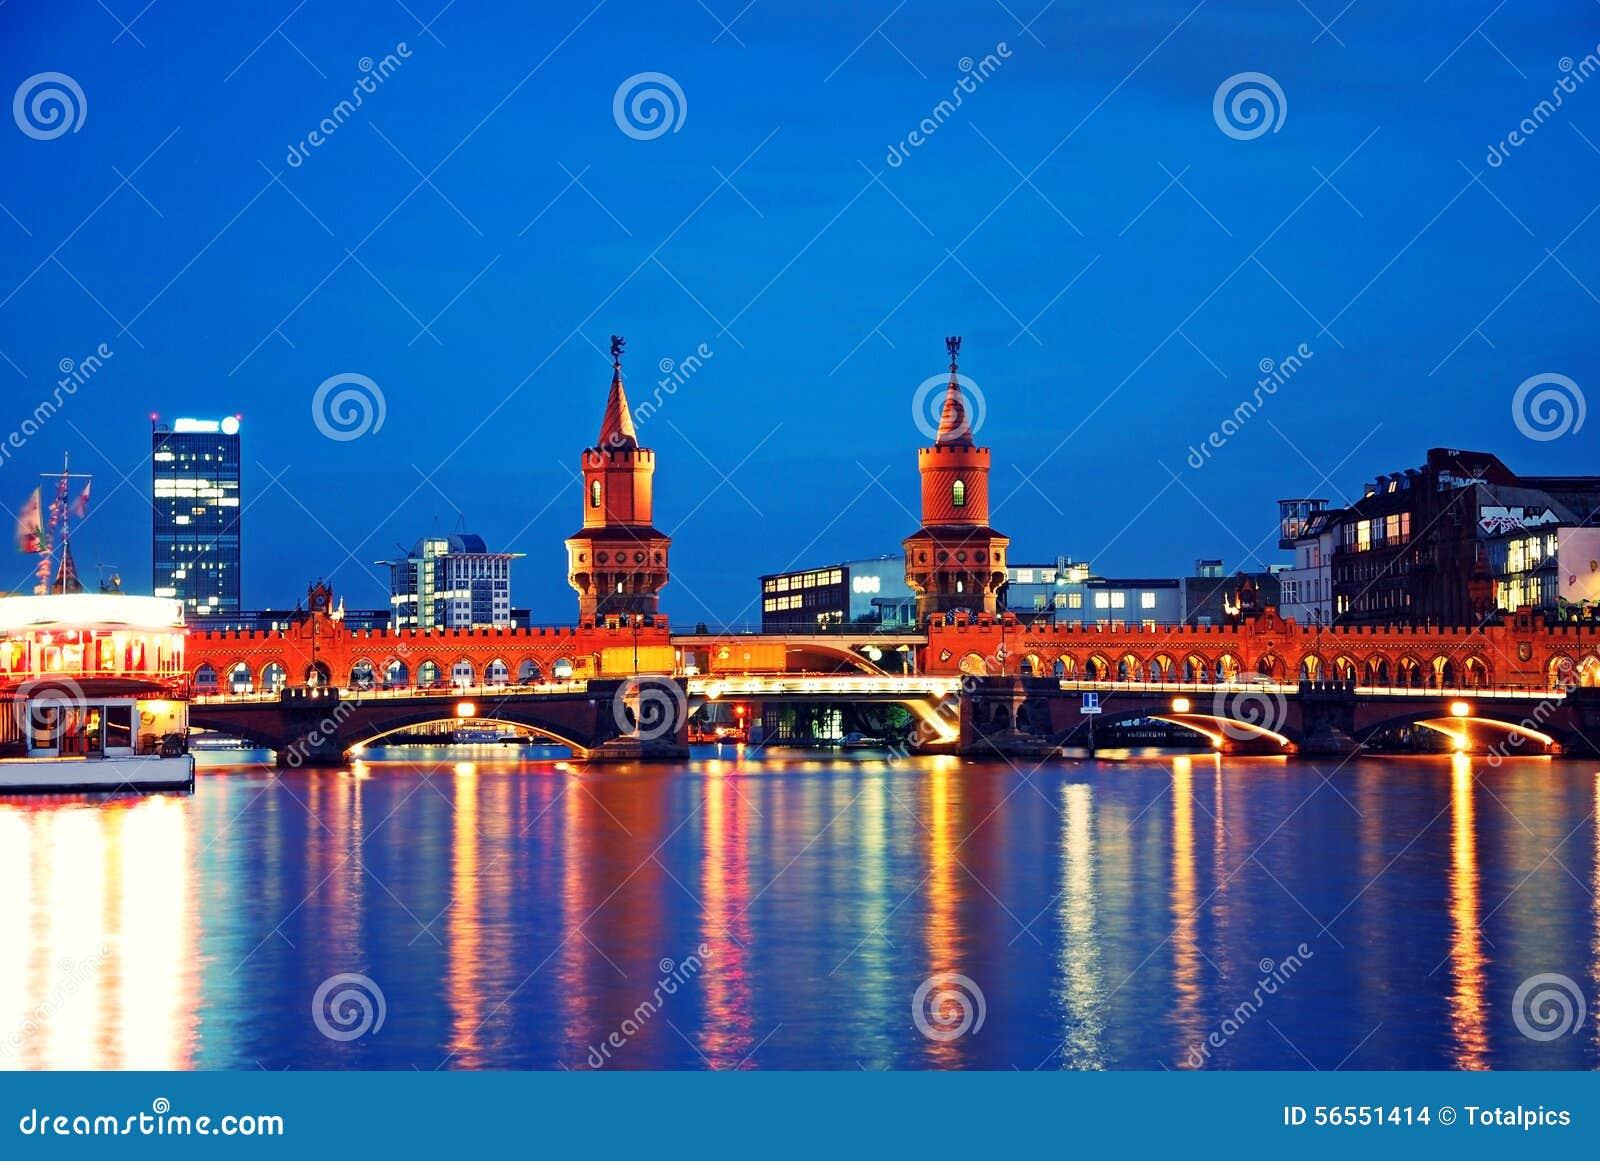 Download Γέφυρα του Βερολίνου Oberbaumbruecke Εκδοτική Στοκ Εικόνα - εικόνα από βακκινίων, νύχτα: 56551414